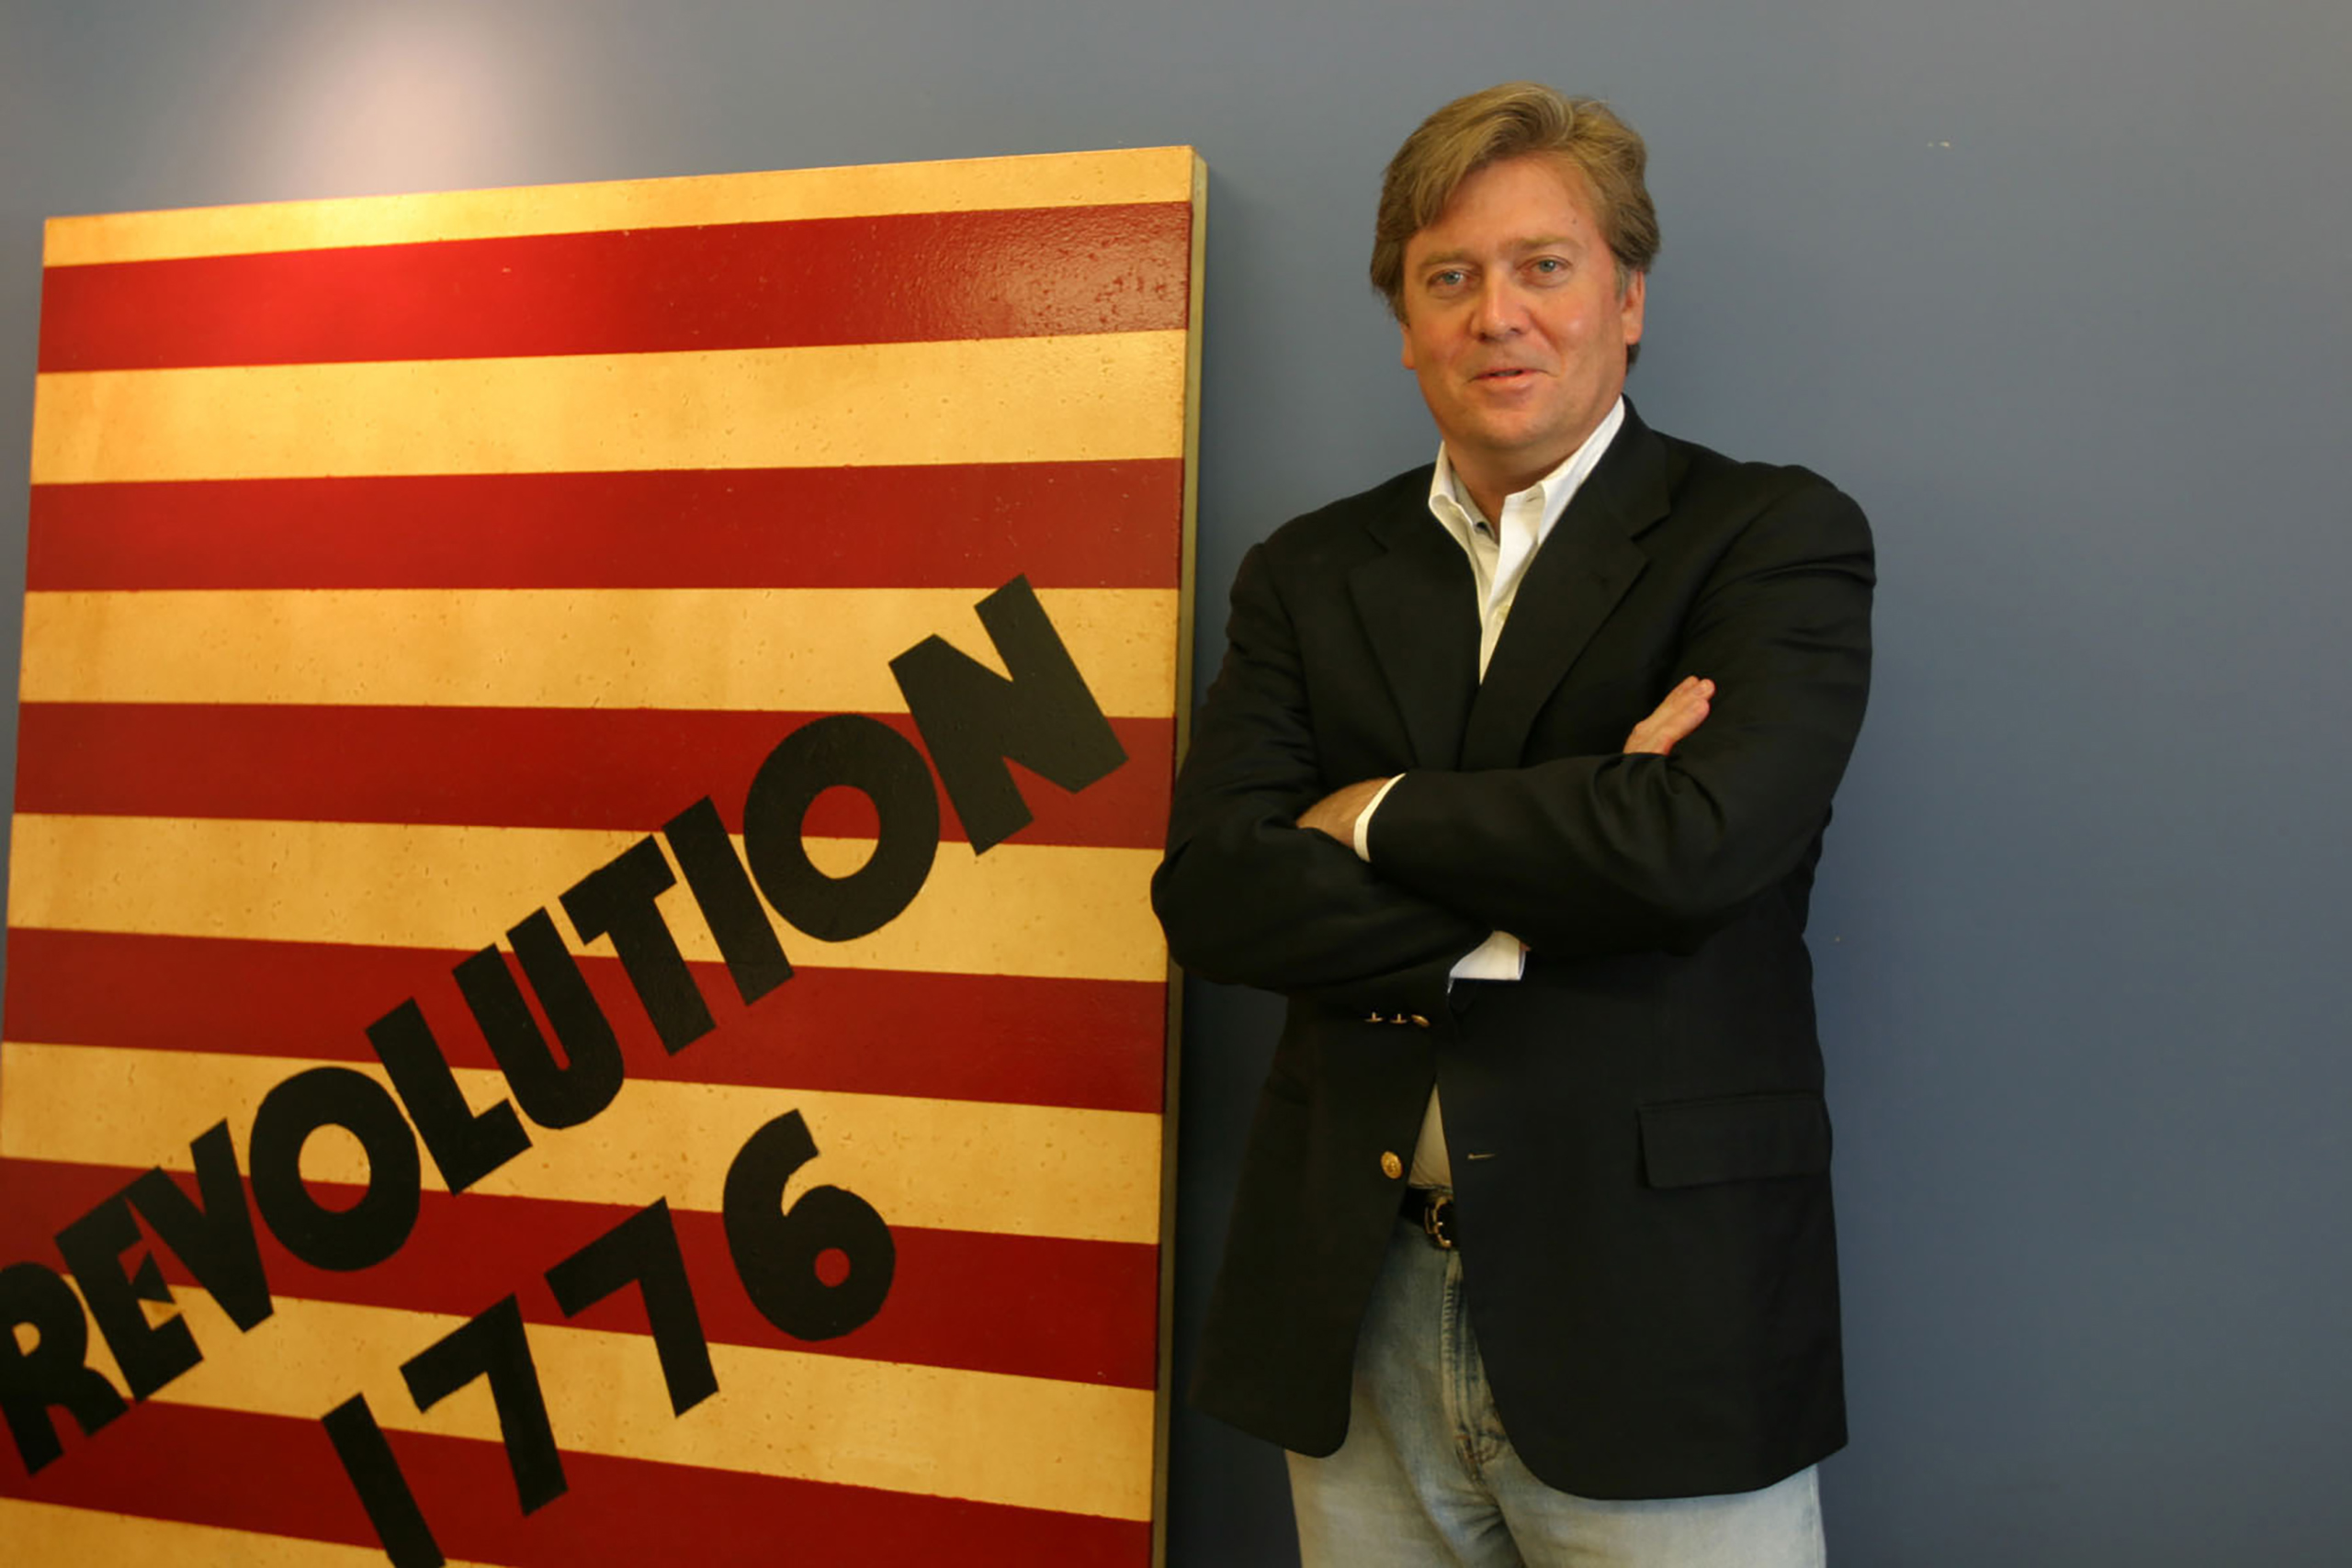 Documentary filmmaker Bannon in his office in Santa Monica, Calif., June 20, 2005.